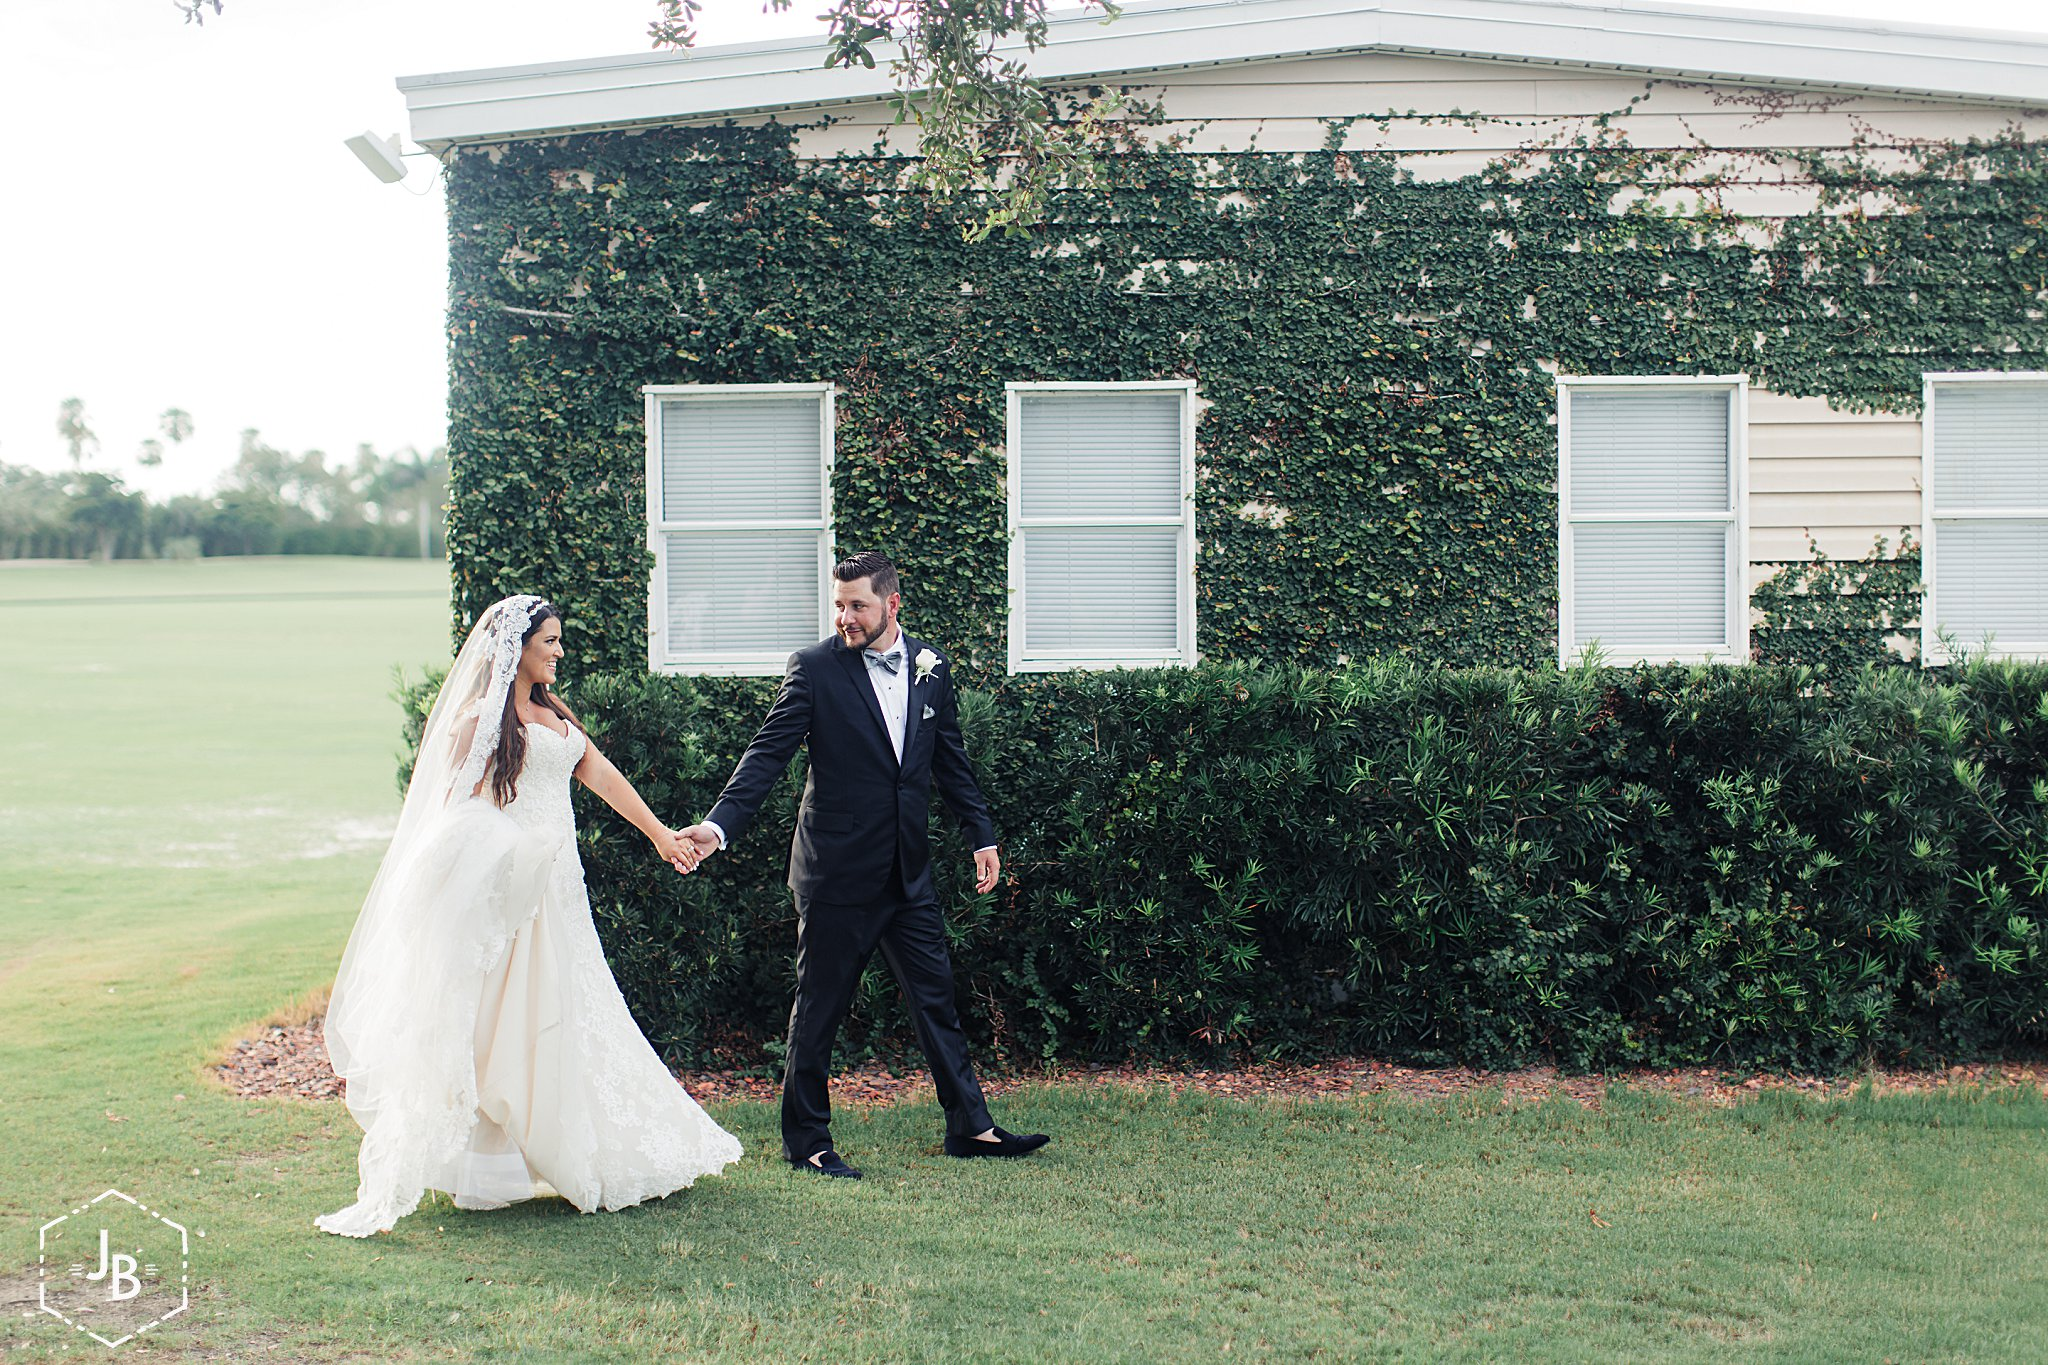 WeddingandEngagementFloridaPhotographer_2810.jpg